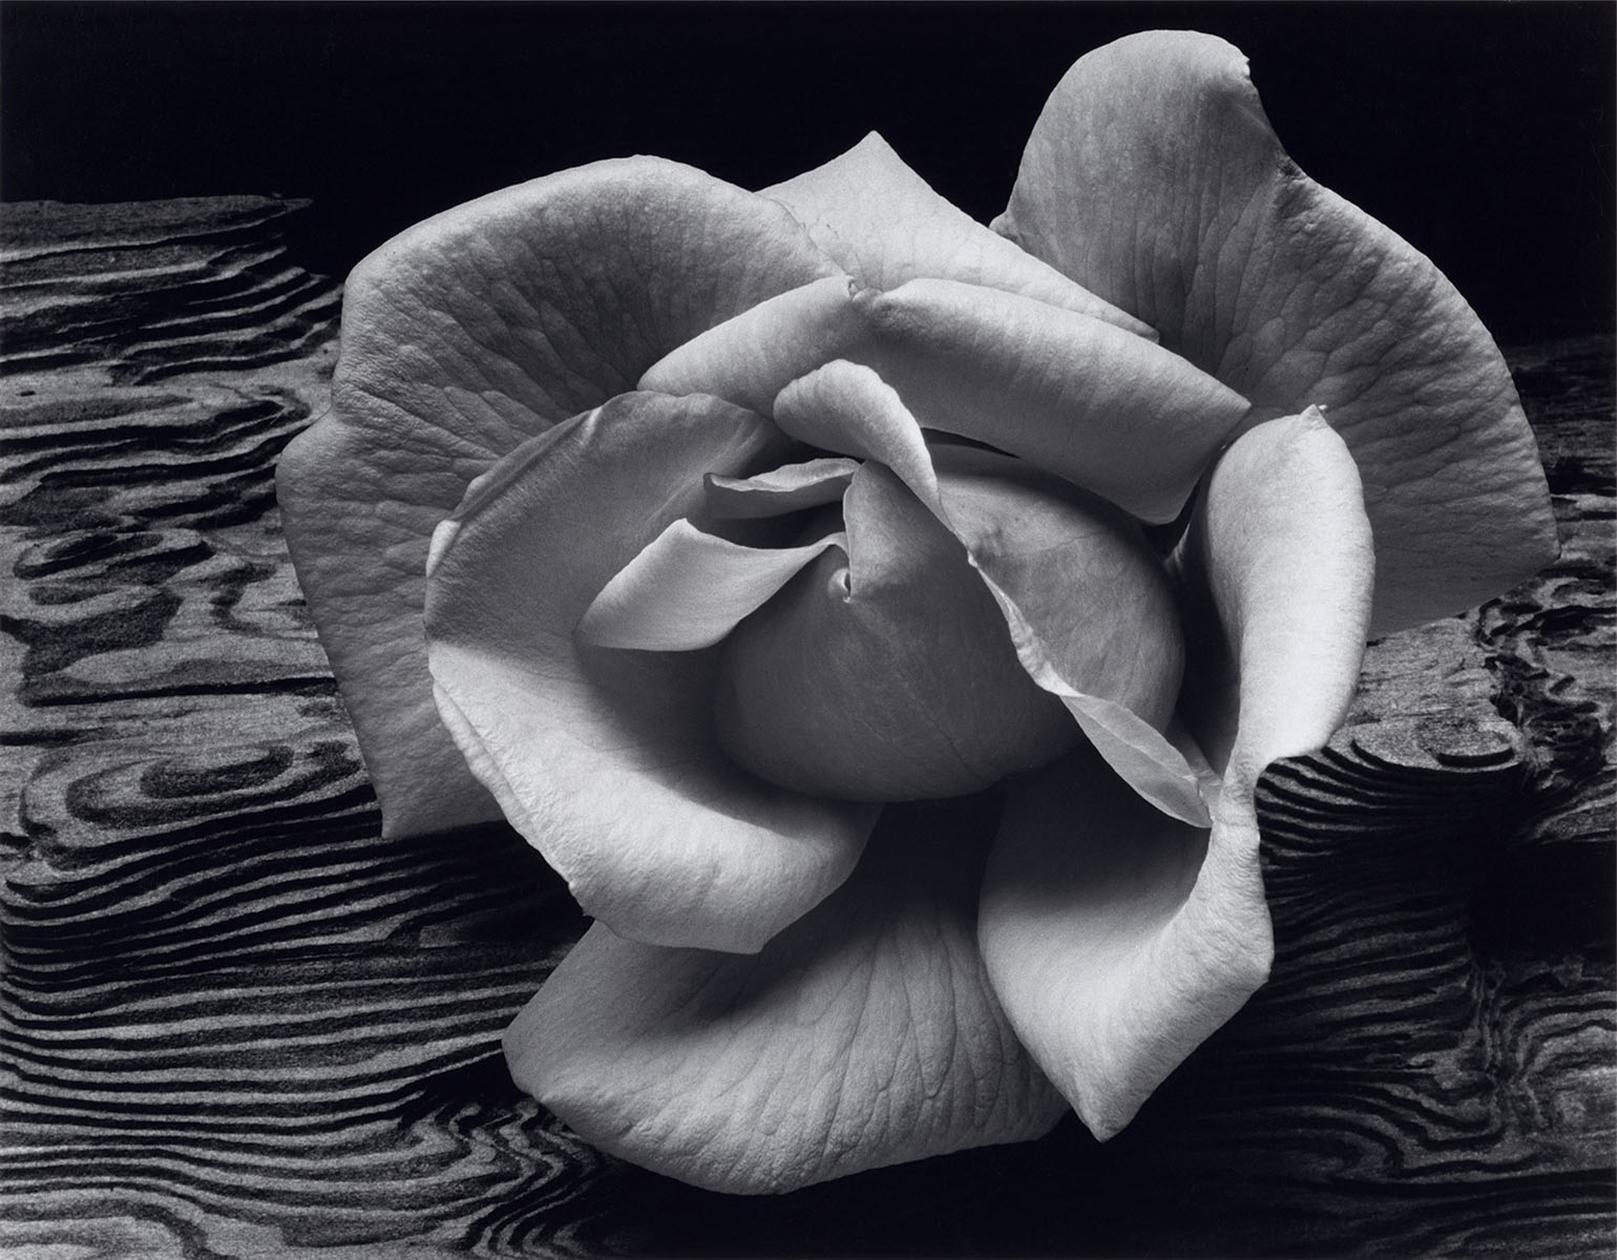 Rose-and-Driftwood-1617x1260 - Ansel Adams.jpg